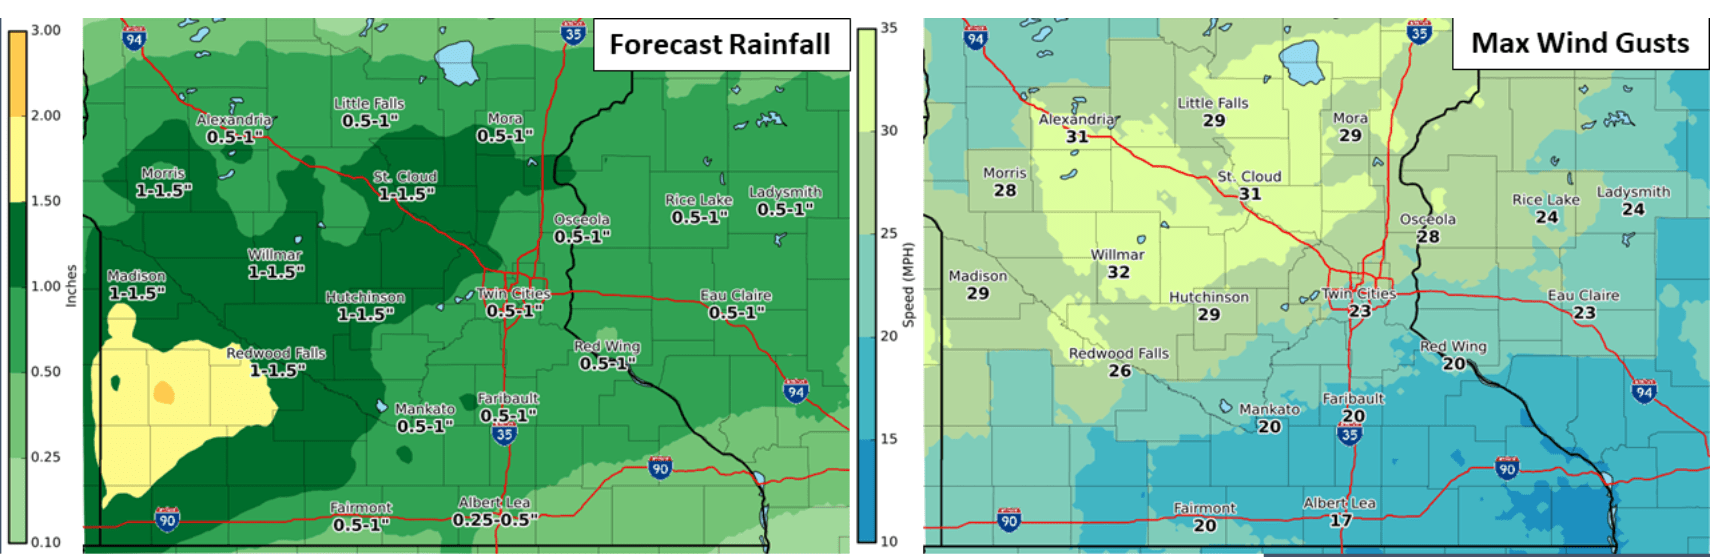 Rain and wind forecast Wednesday